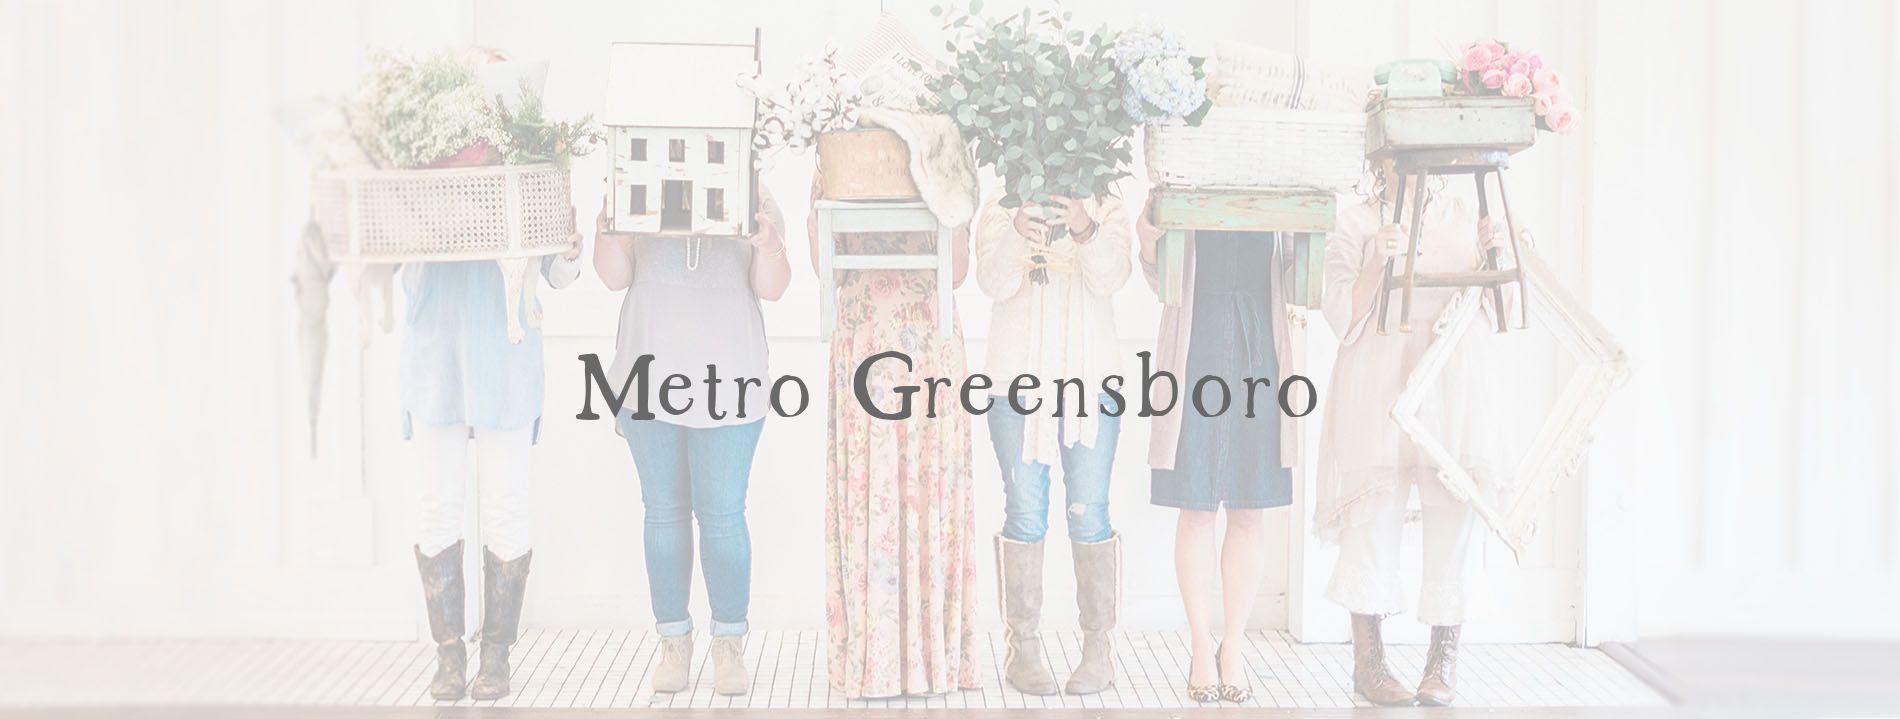 Metro Greensboro